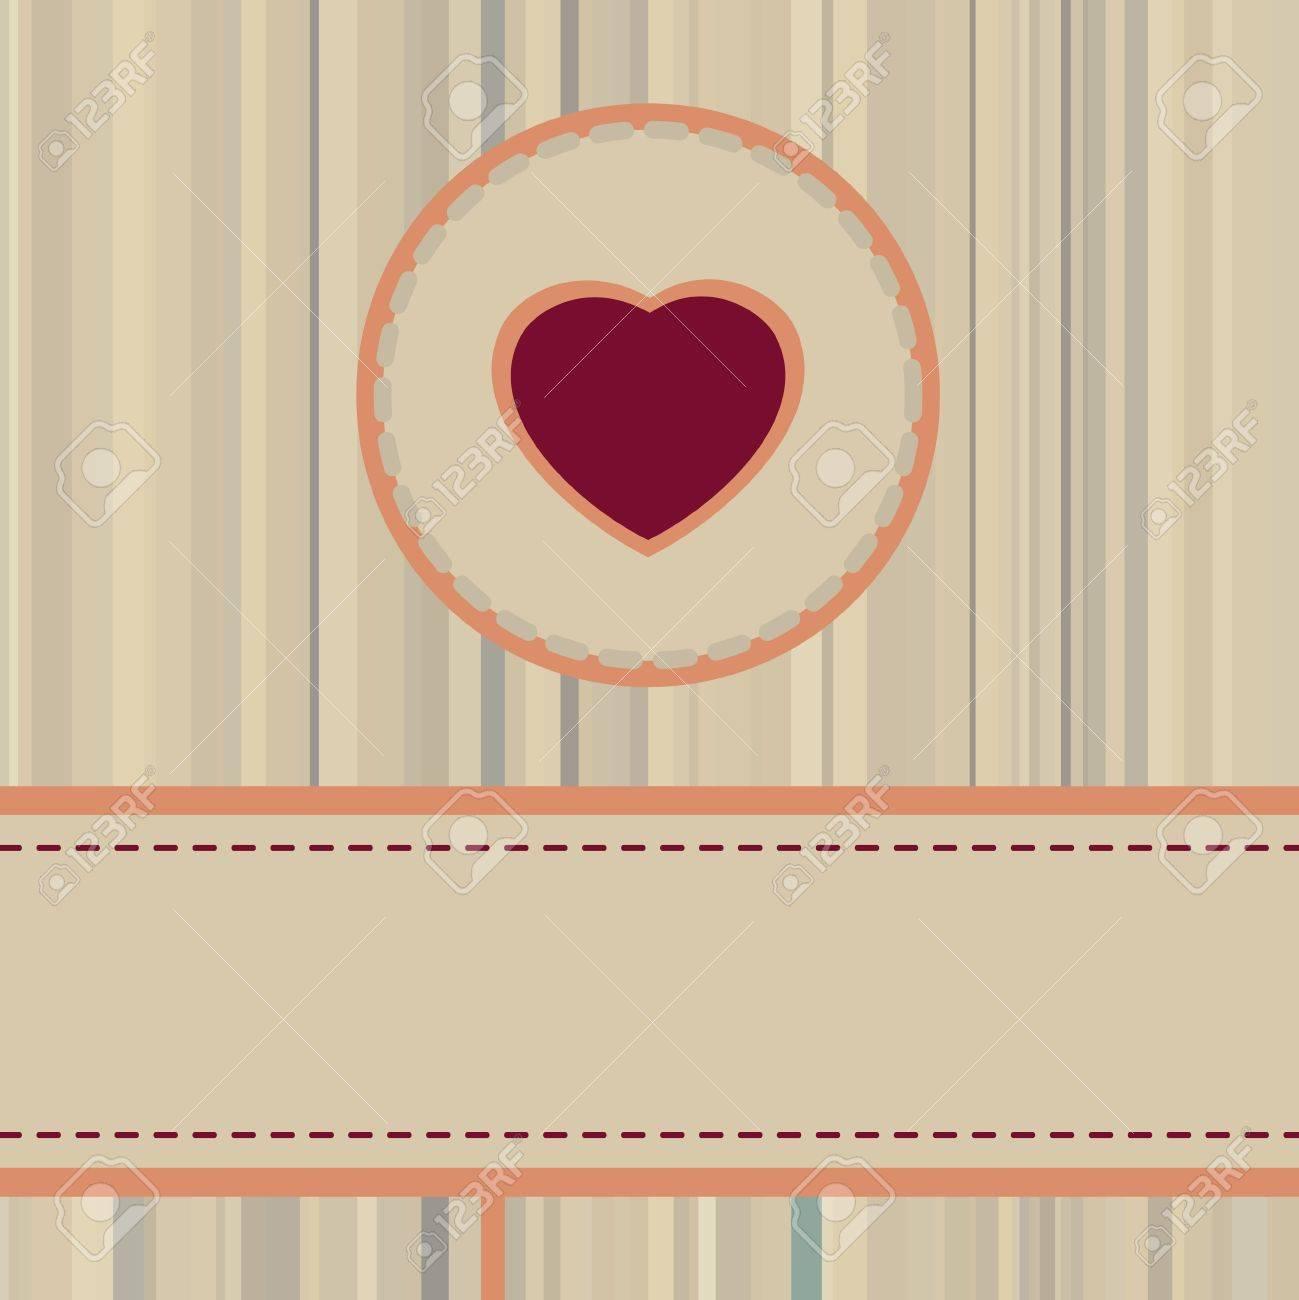 Vintage valentine Card or package design. Stock Vector - 11585360